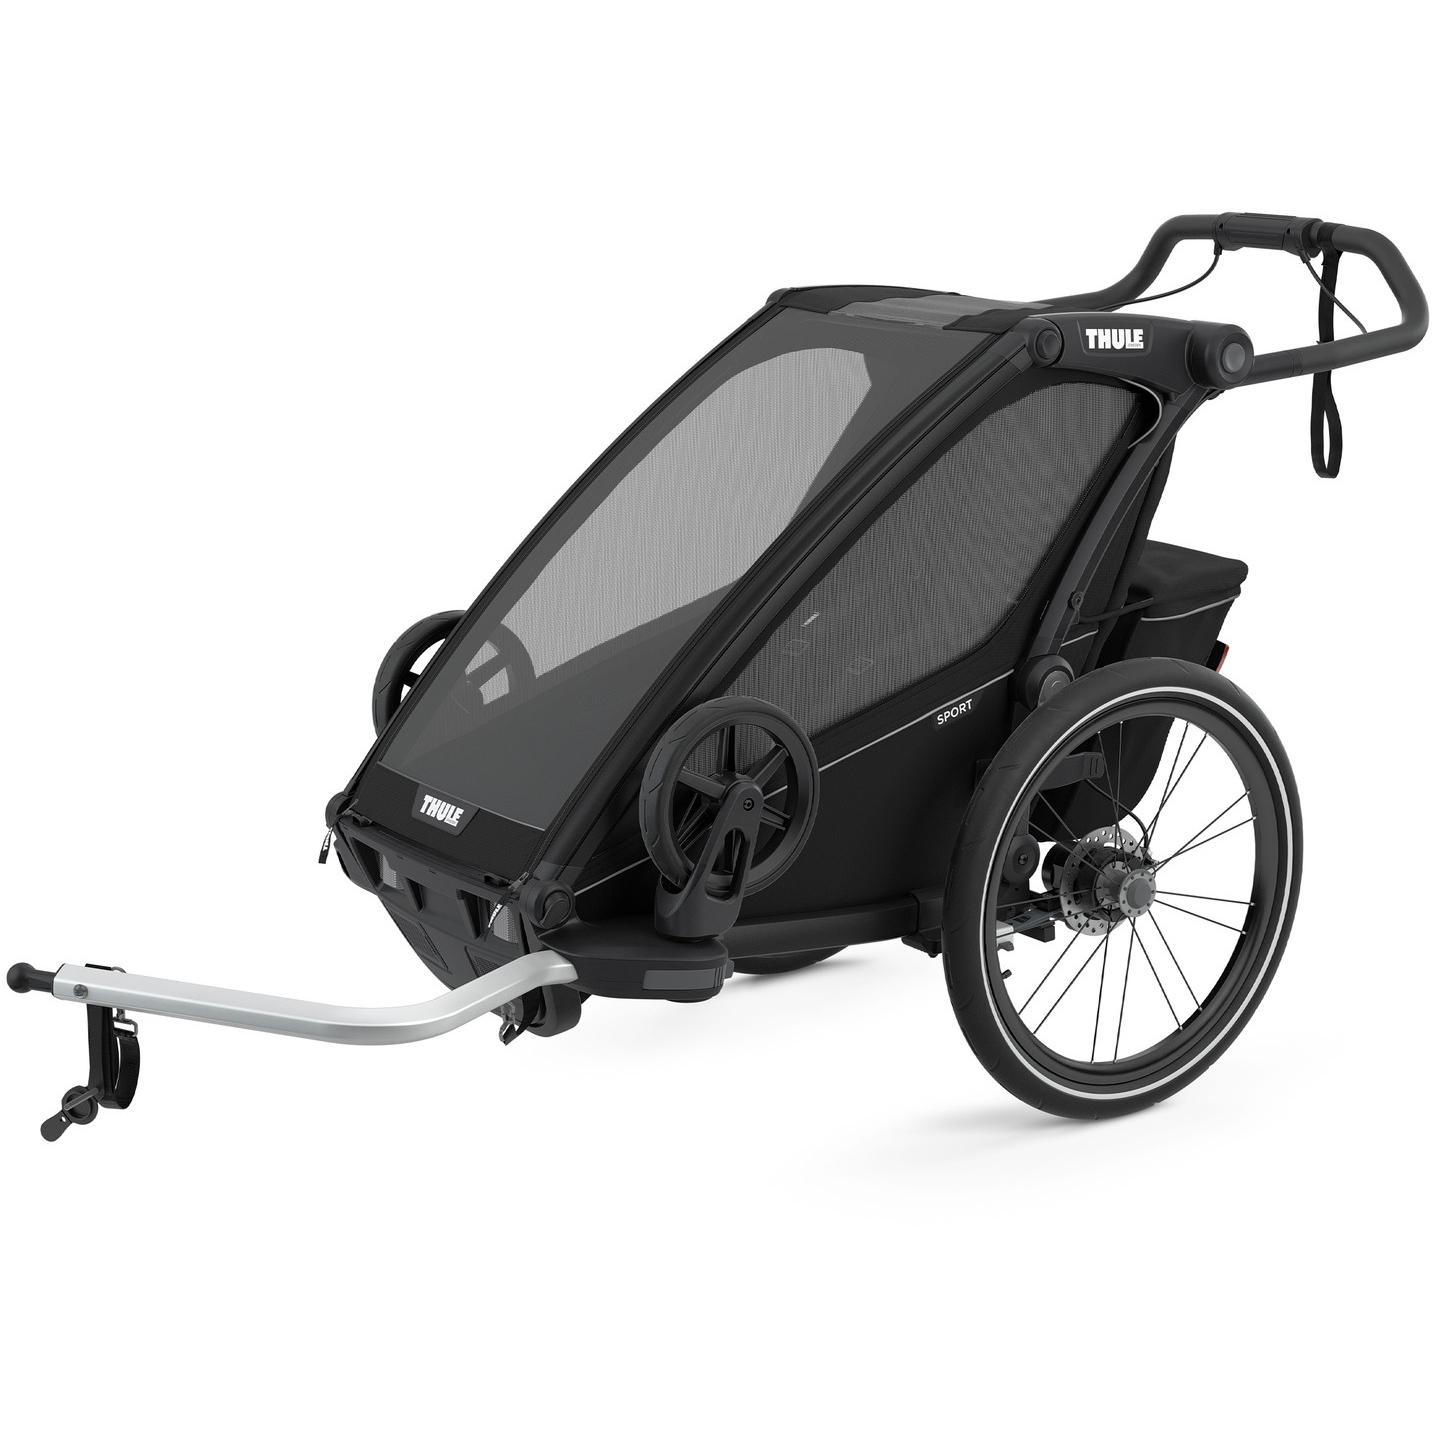 Foto de Thule Chariot Sport 1 - Remolque de bicicleta para 1 niño - midnight black